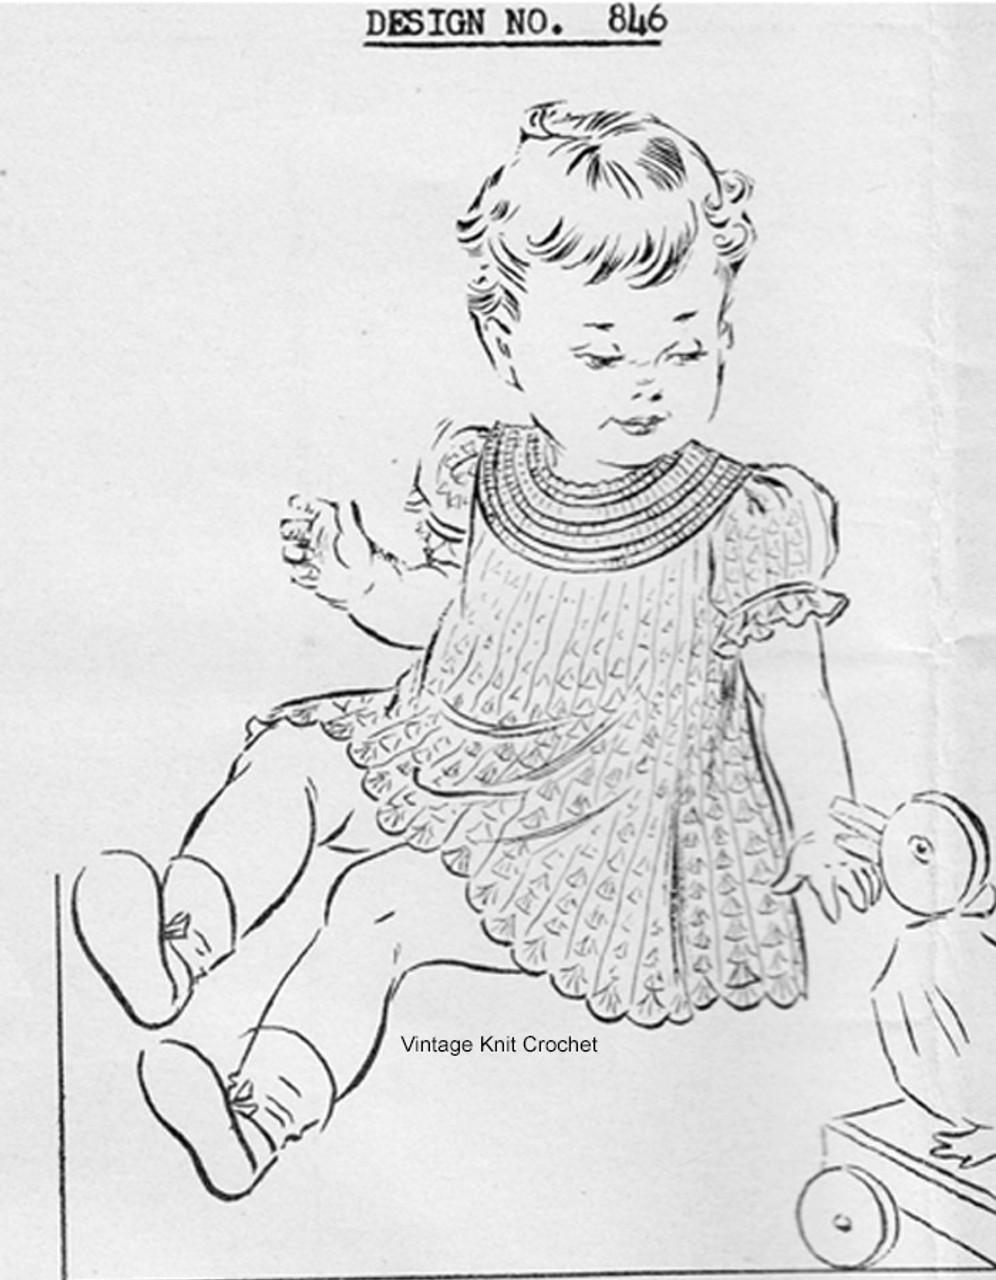 Baby Crochet Dress Pattern, Shell Stitch, Mail Order 846